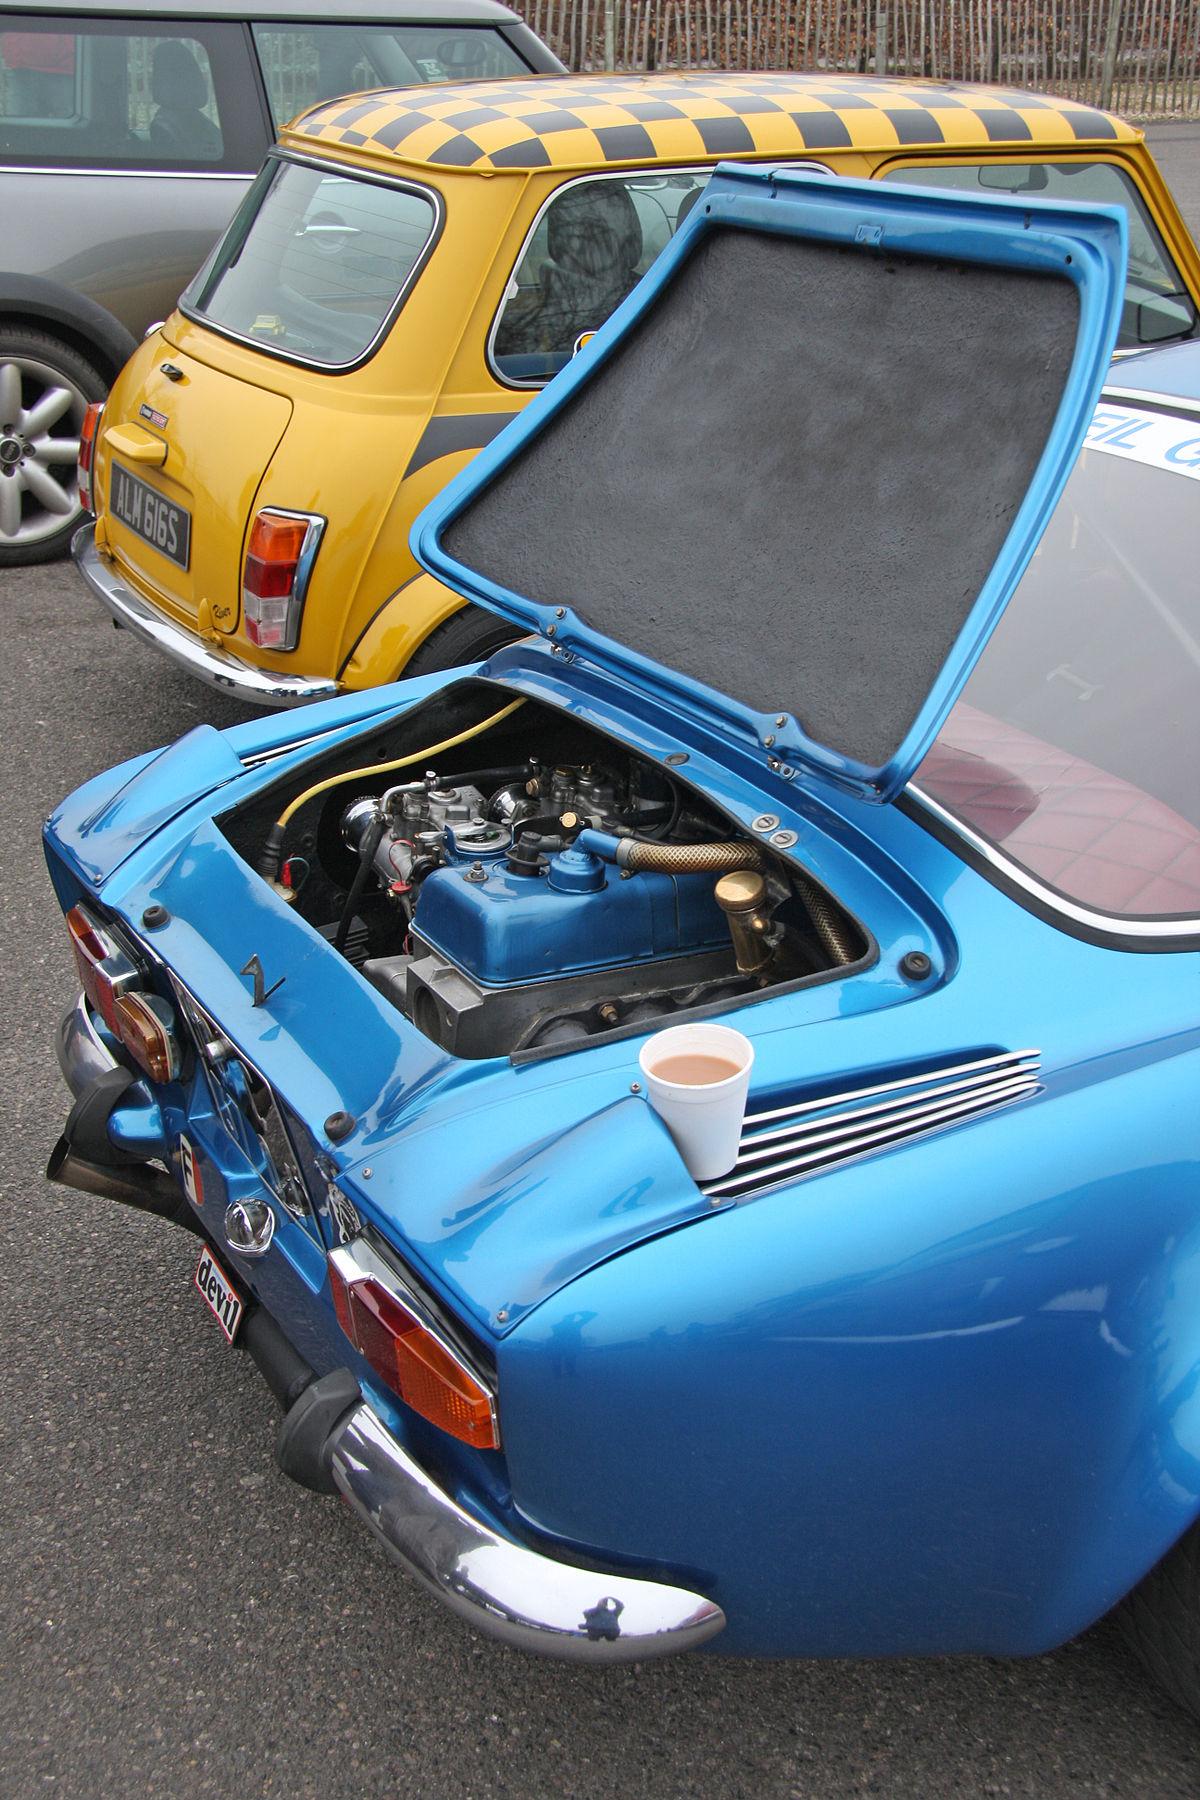 renault cl u00e9on-alu engine